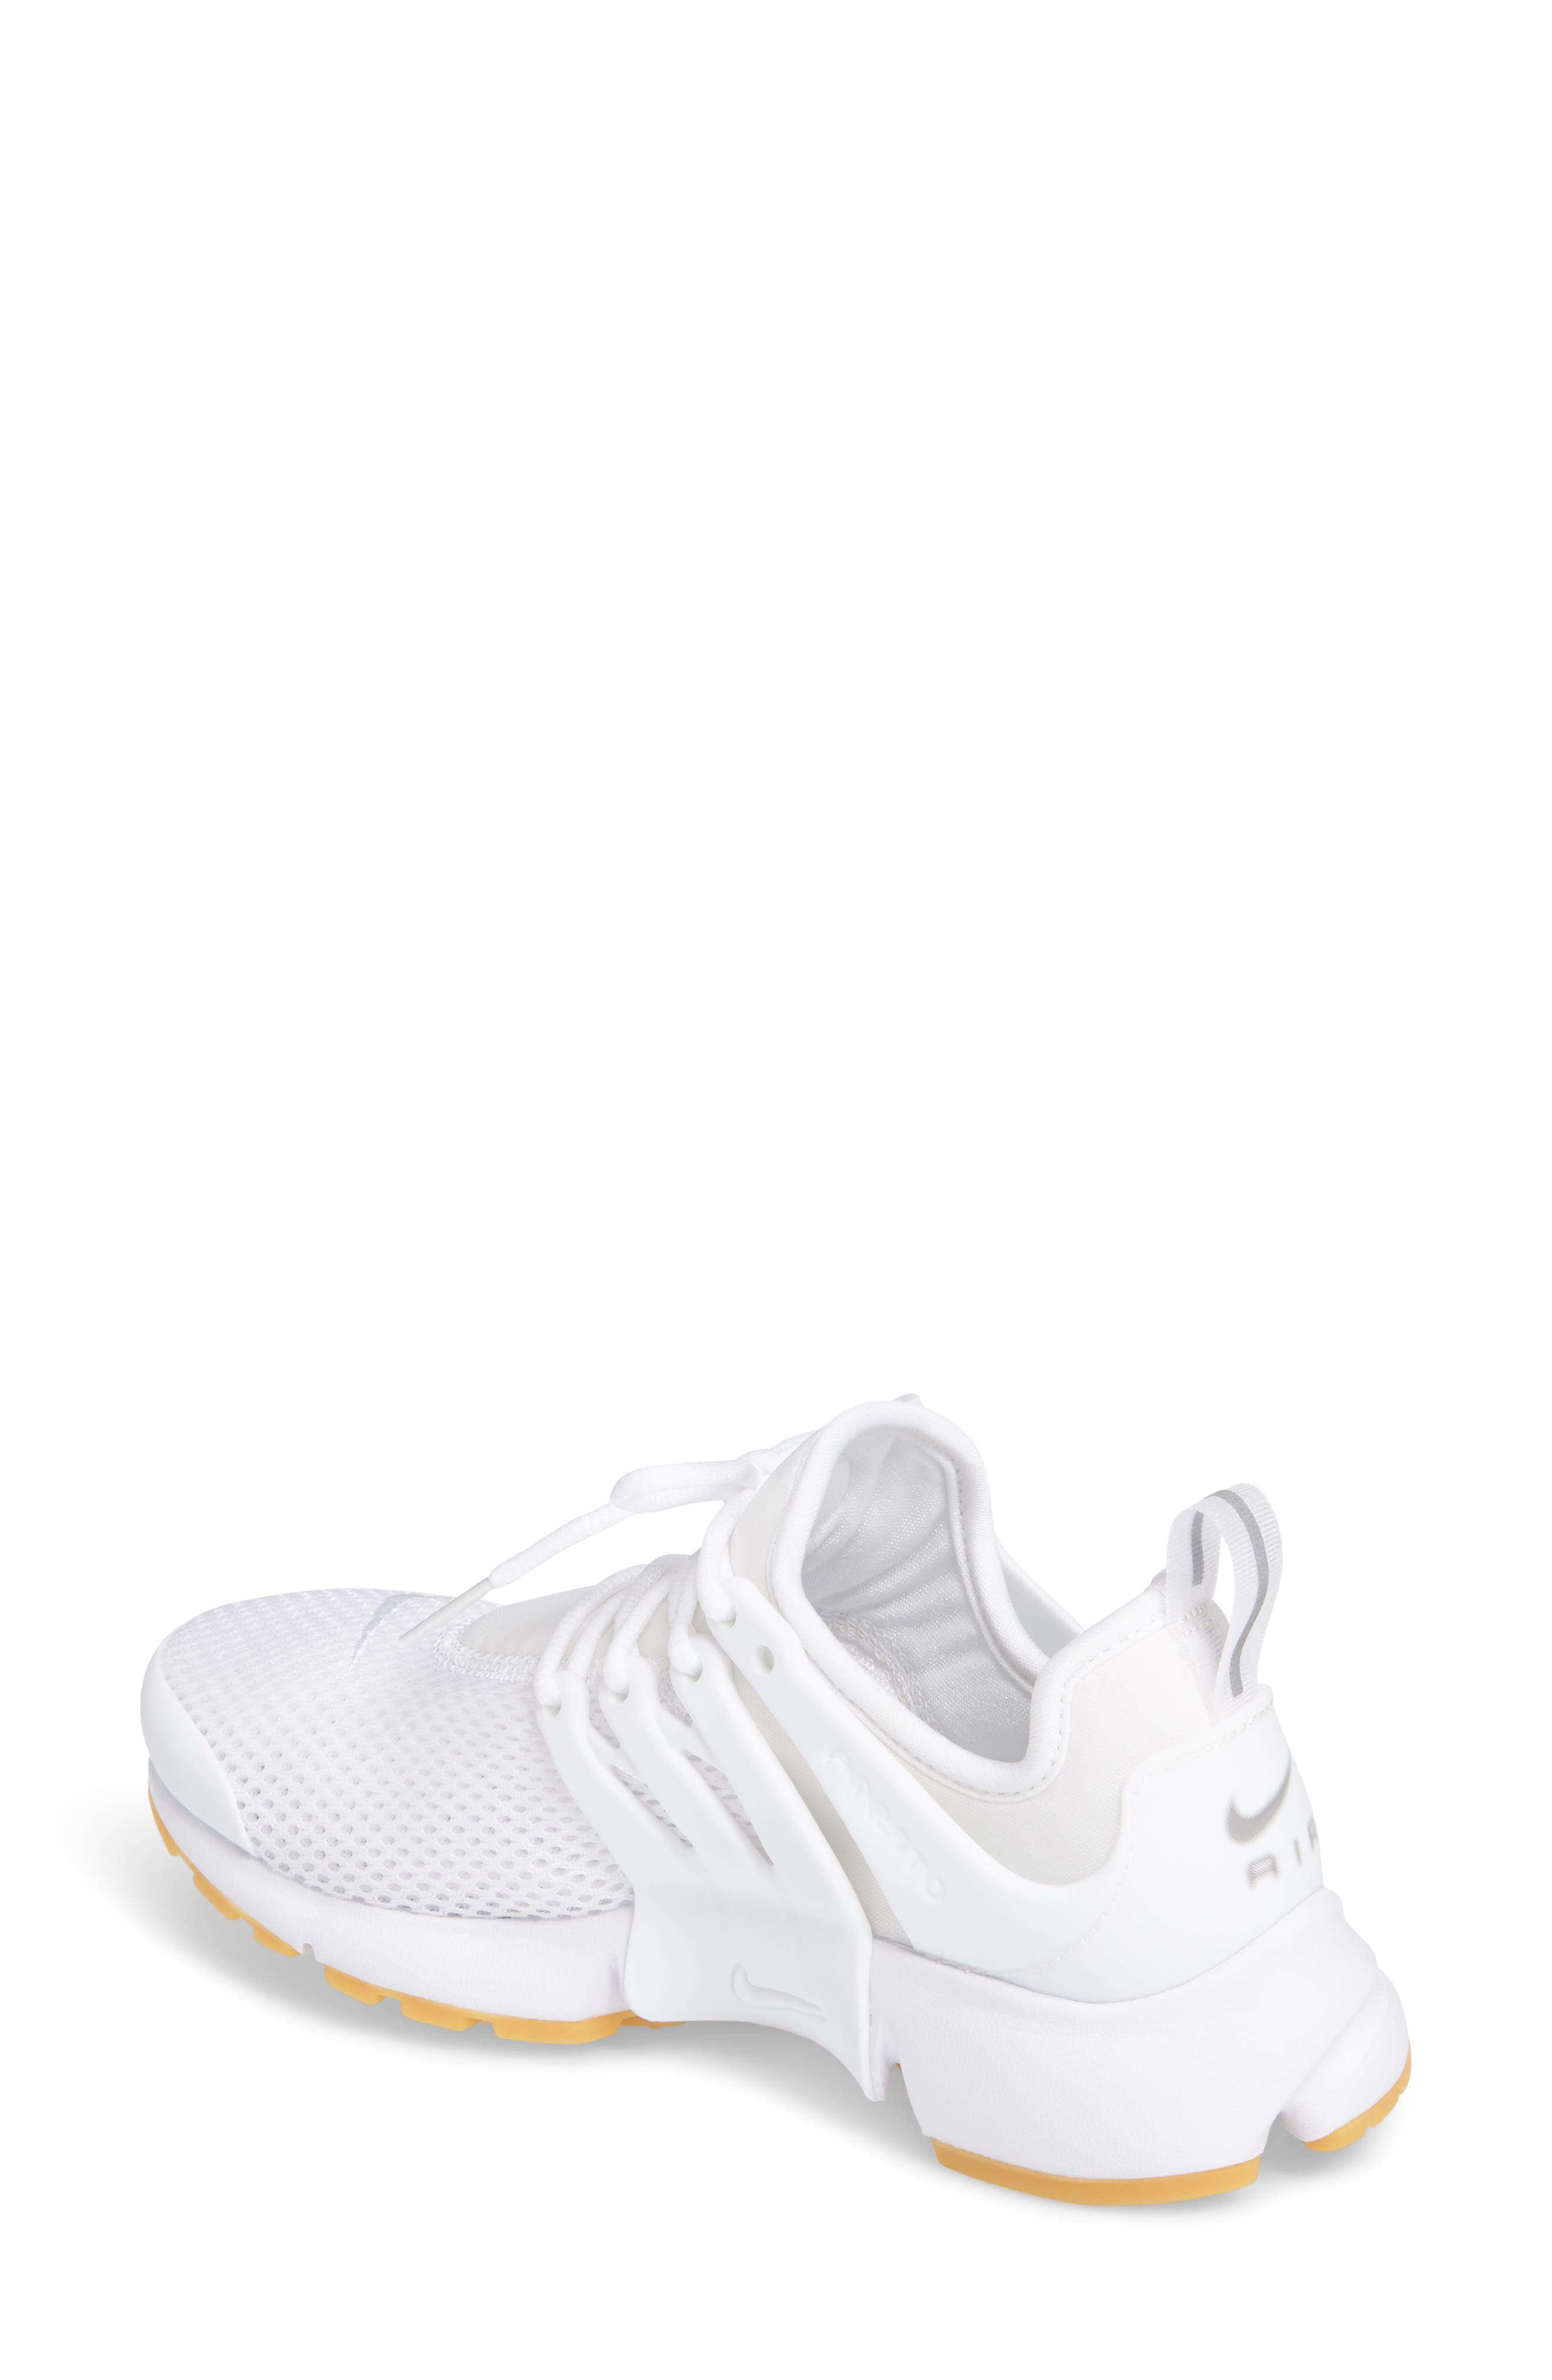 Air Presto Flyknit Ultra Sneaker,                             Alternate thumbnail 2, color,                             White/ Gum Yellow/ Wolf Grey